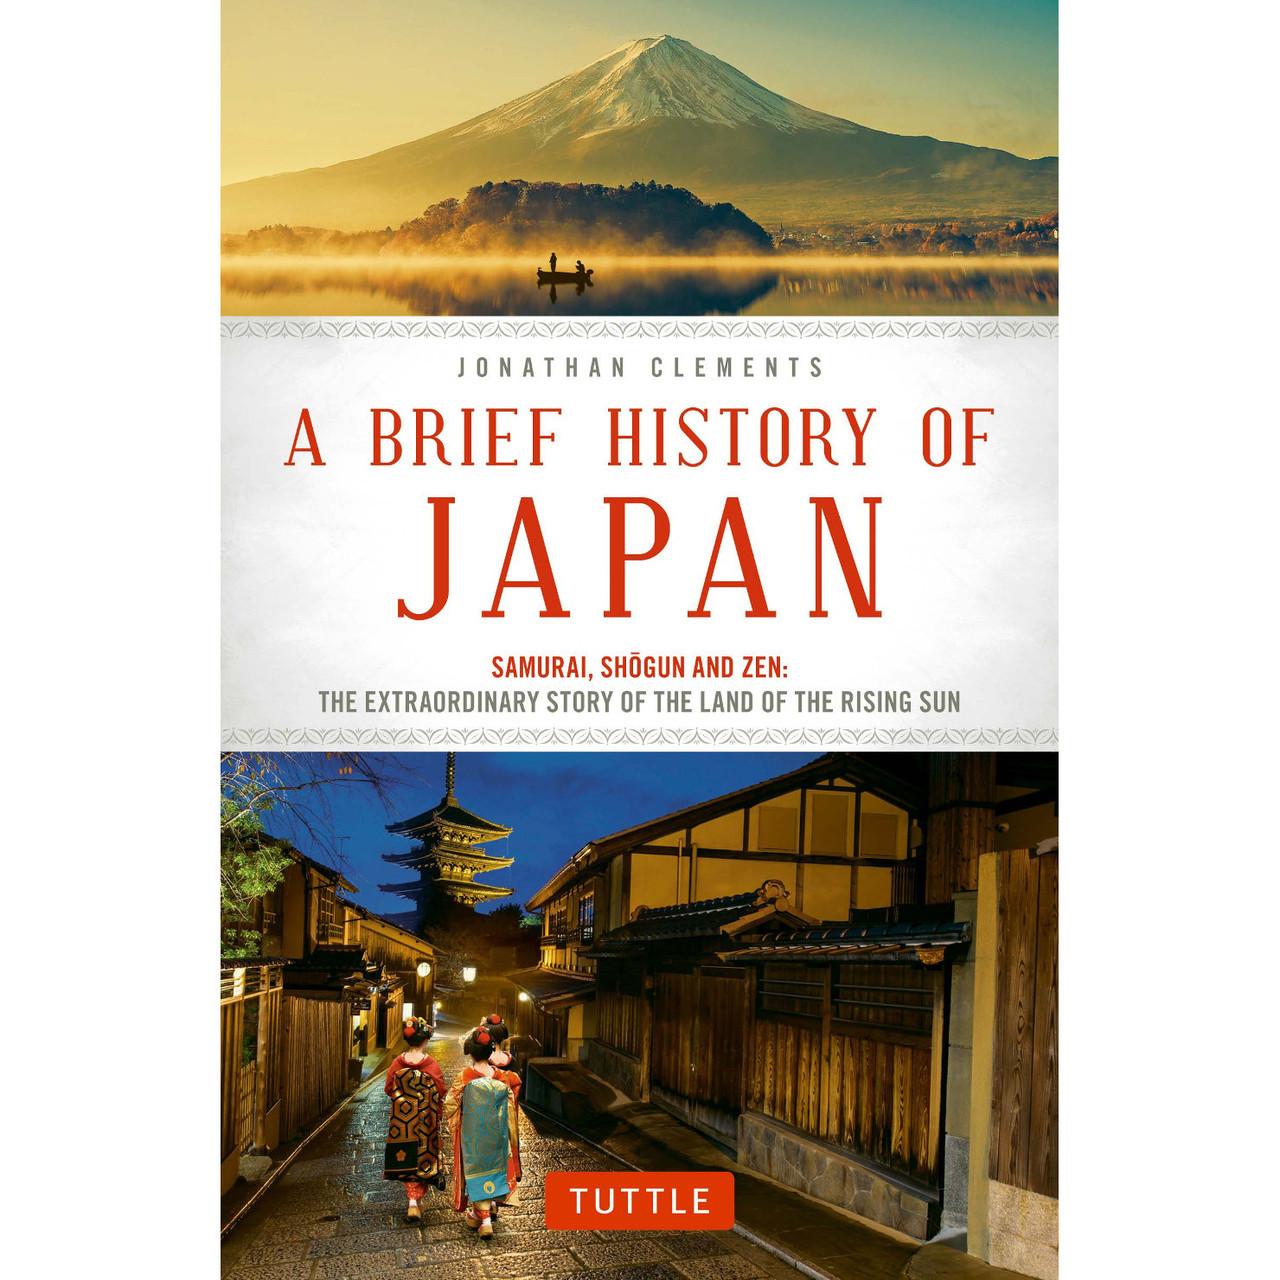 Amazon.com: History: Books: Europe, Americas, World ...